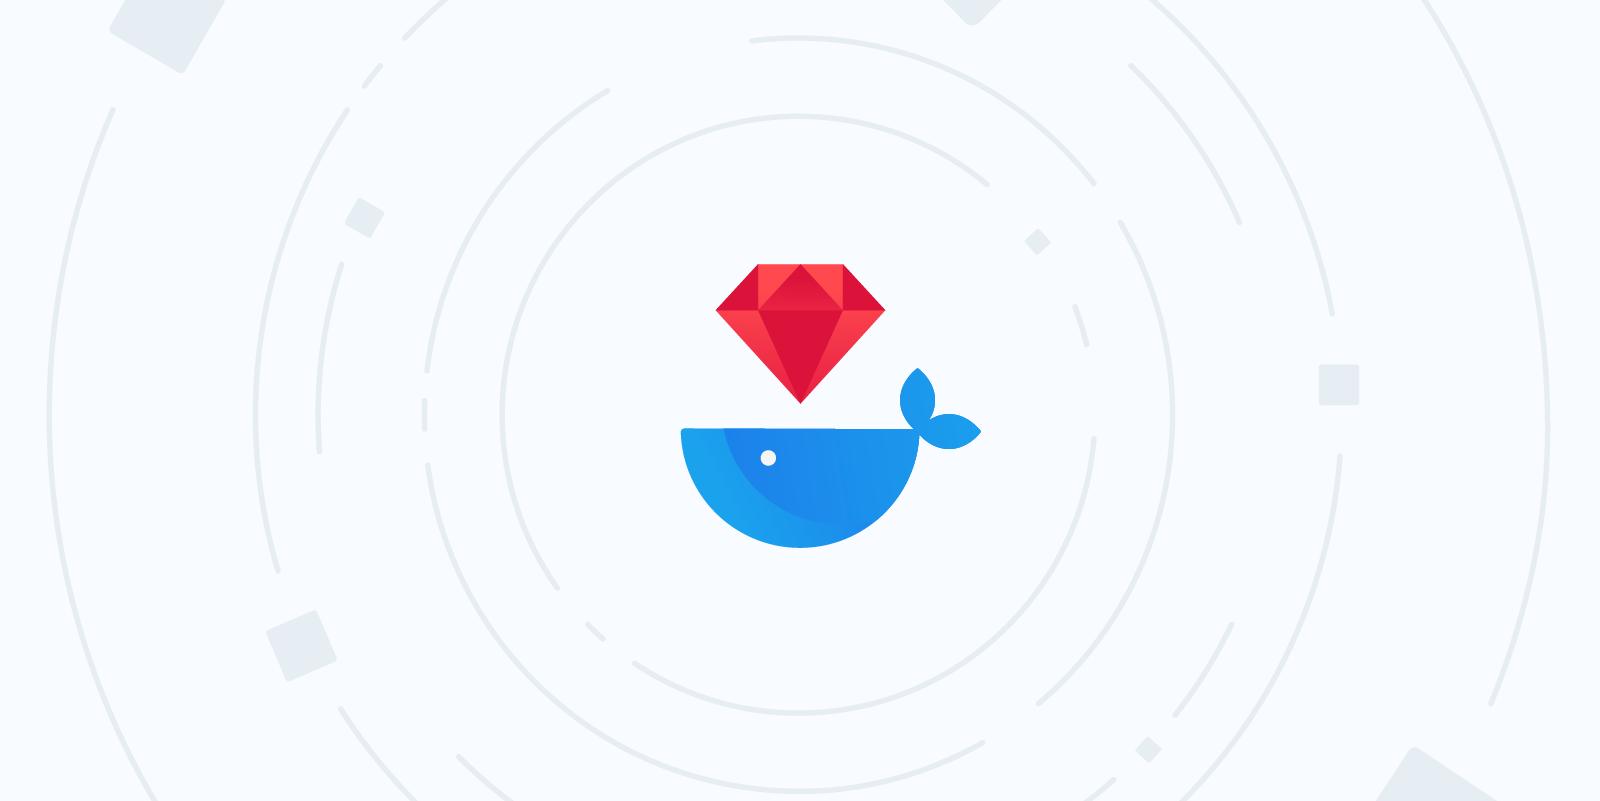 Dockerizing an existing Rails-Postgresql app with Docker